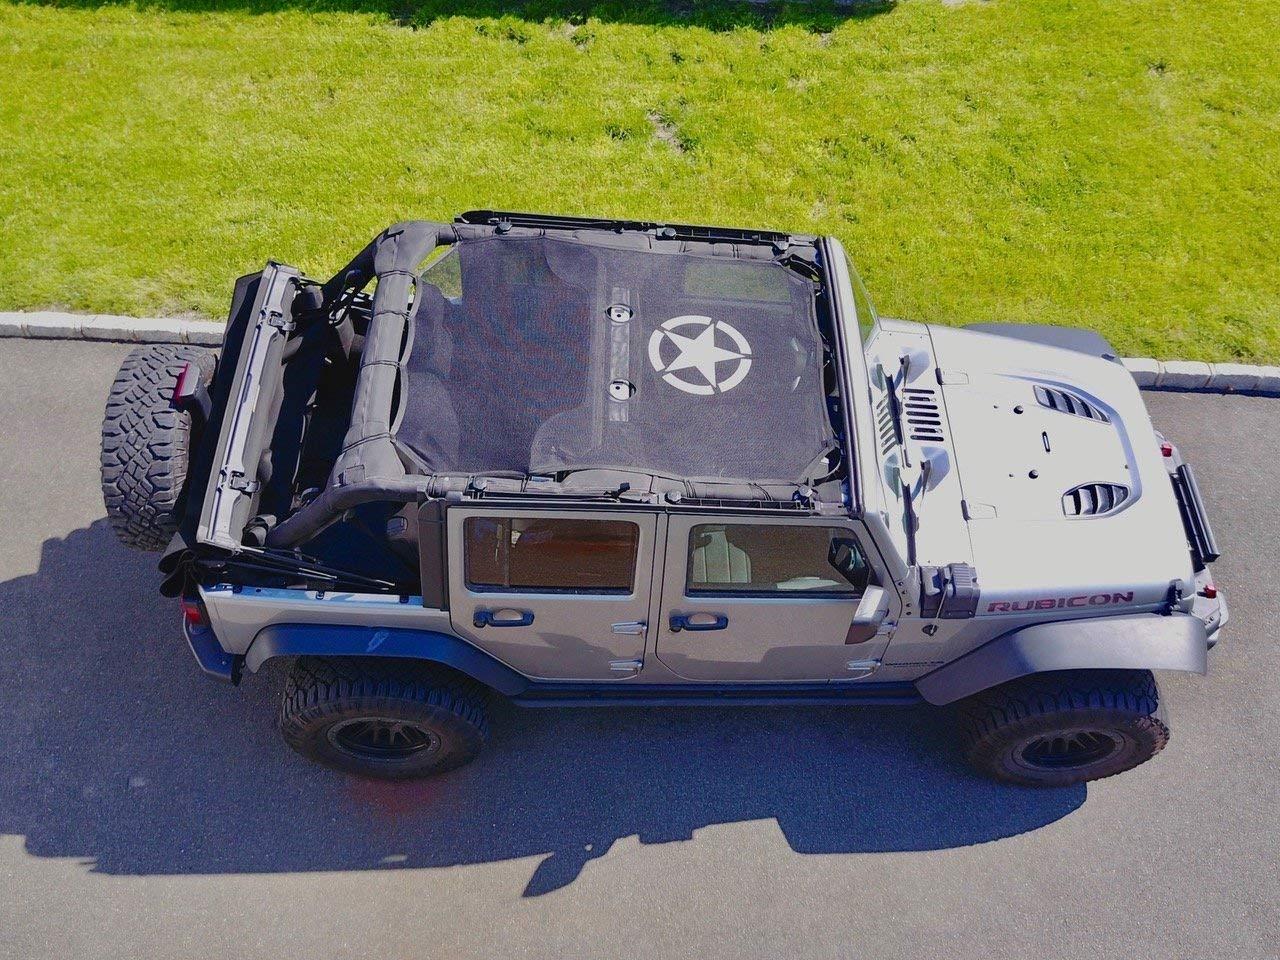 Sun Shade Sunshade Mesh Full Top Cover UV Protection For Jeep Wrangler JK 4 Door